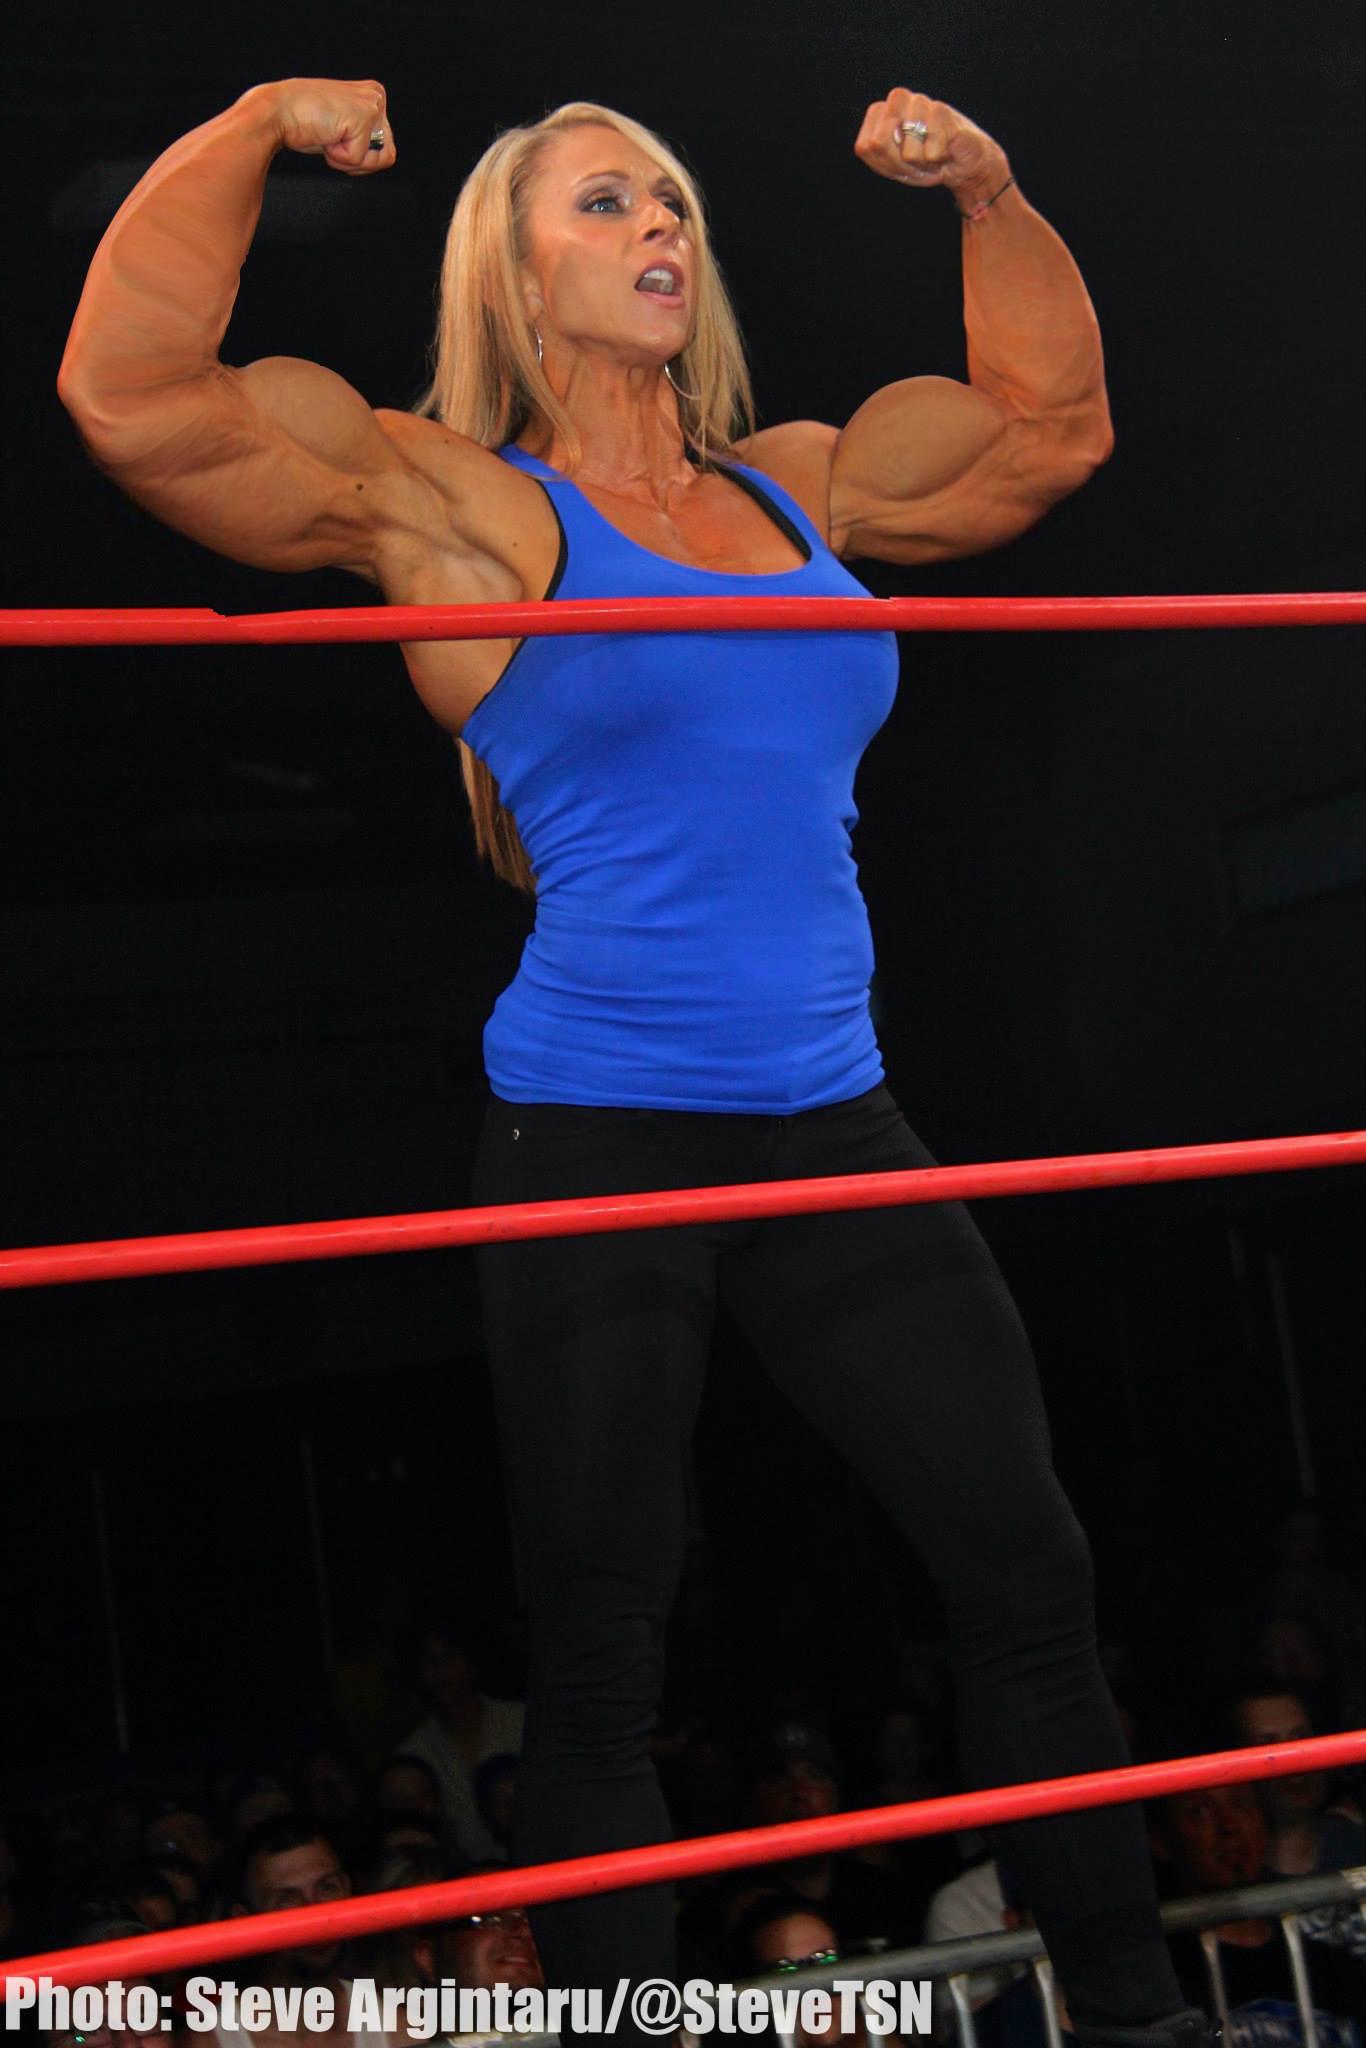 Mindi O'Brien Muscle Morph by fatehound45